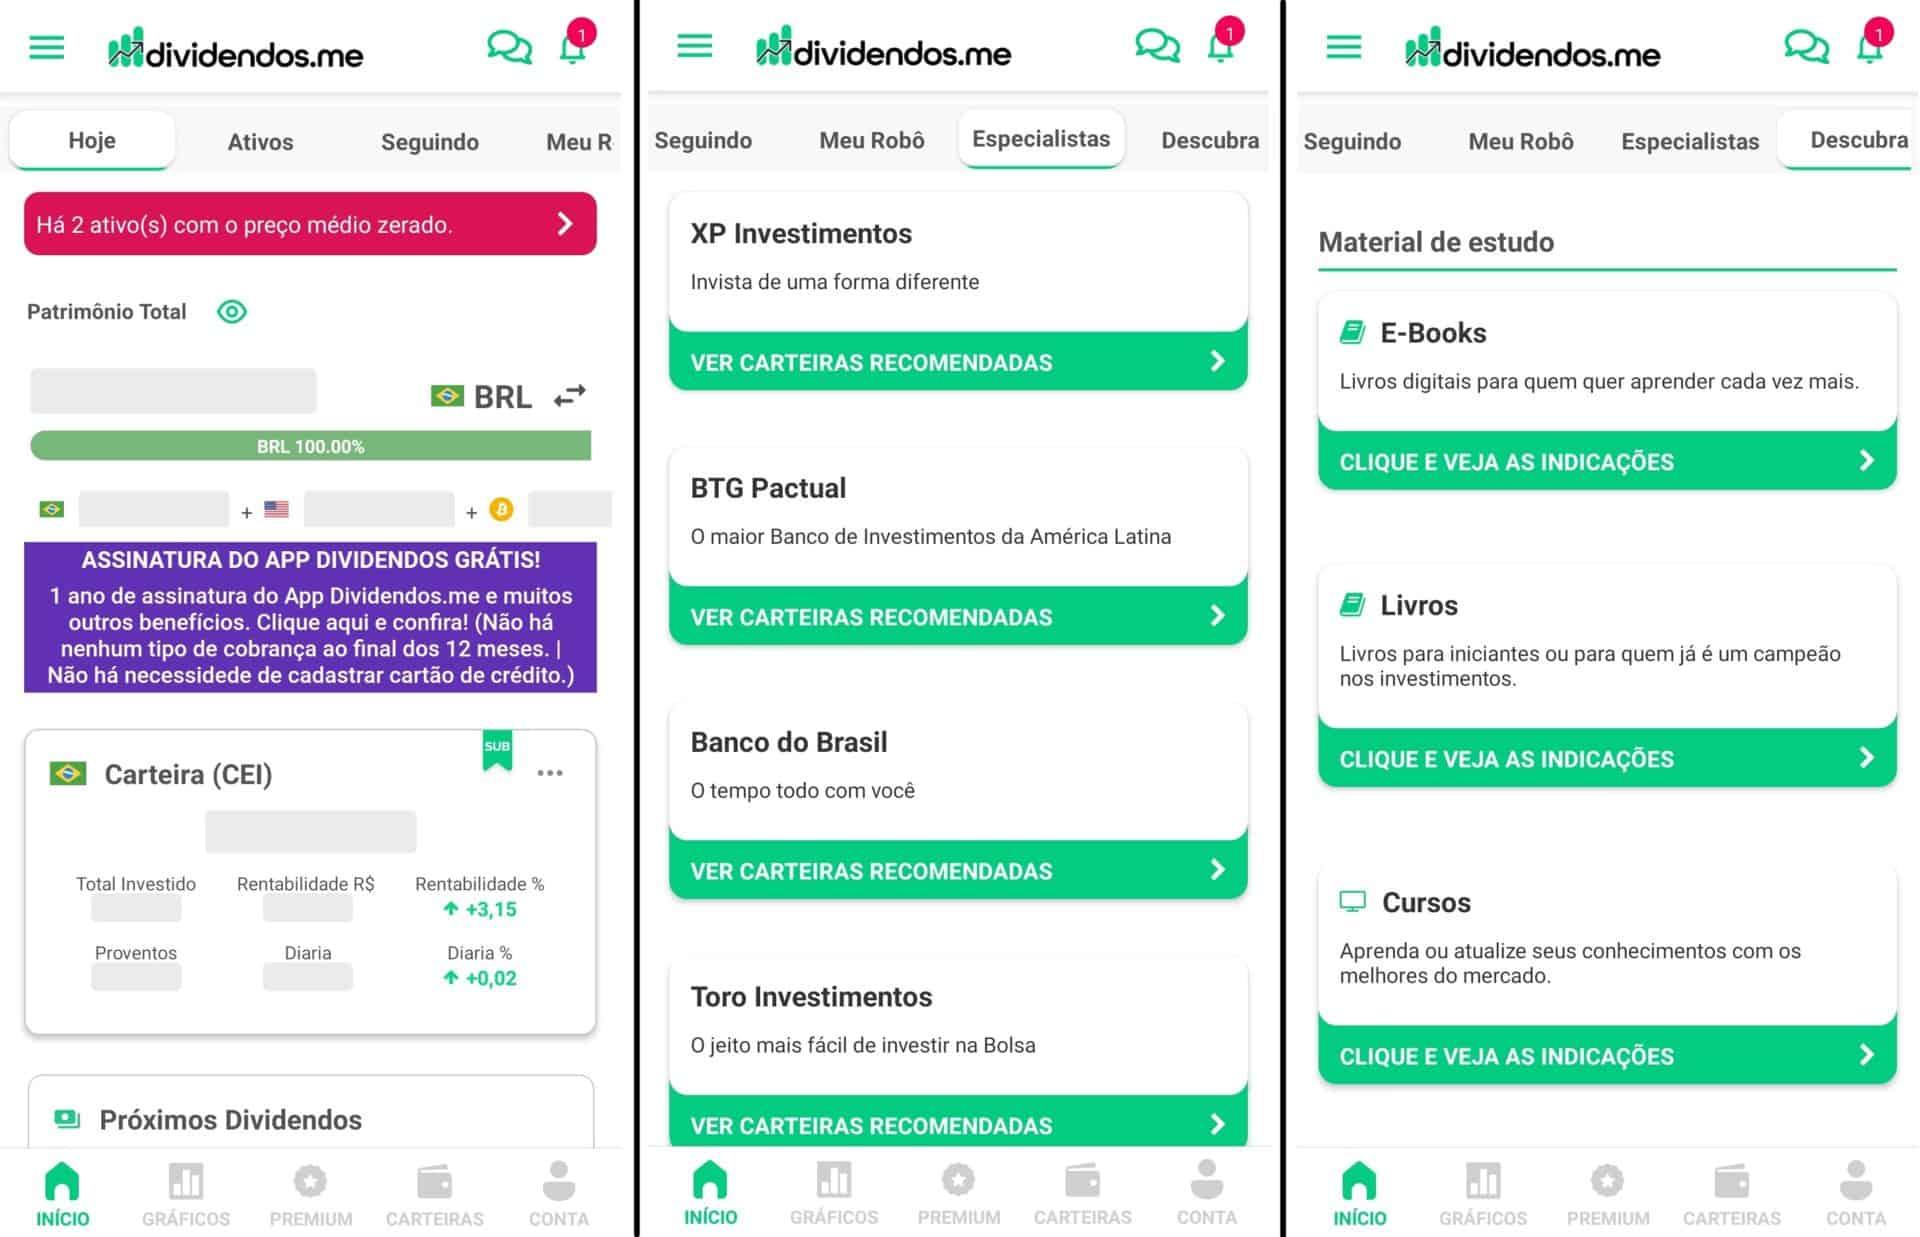 interface do app dividendos